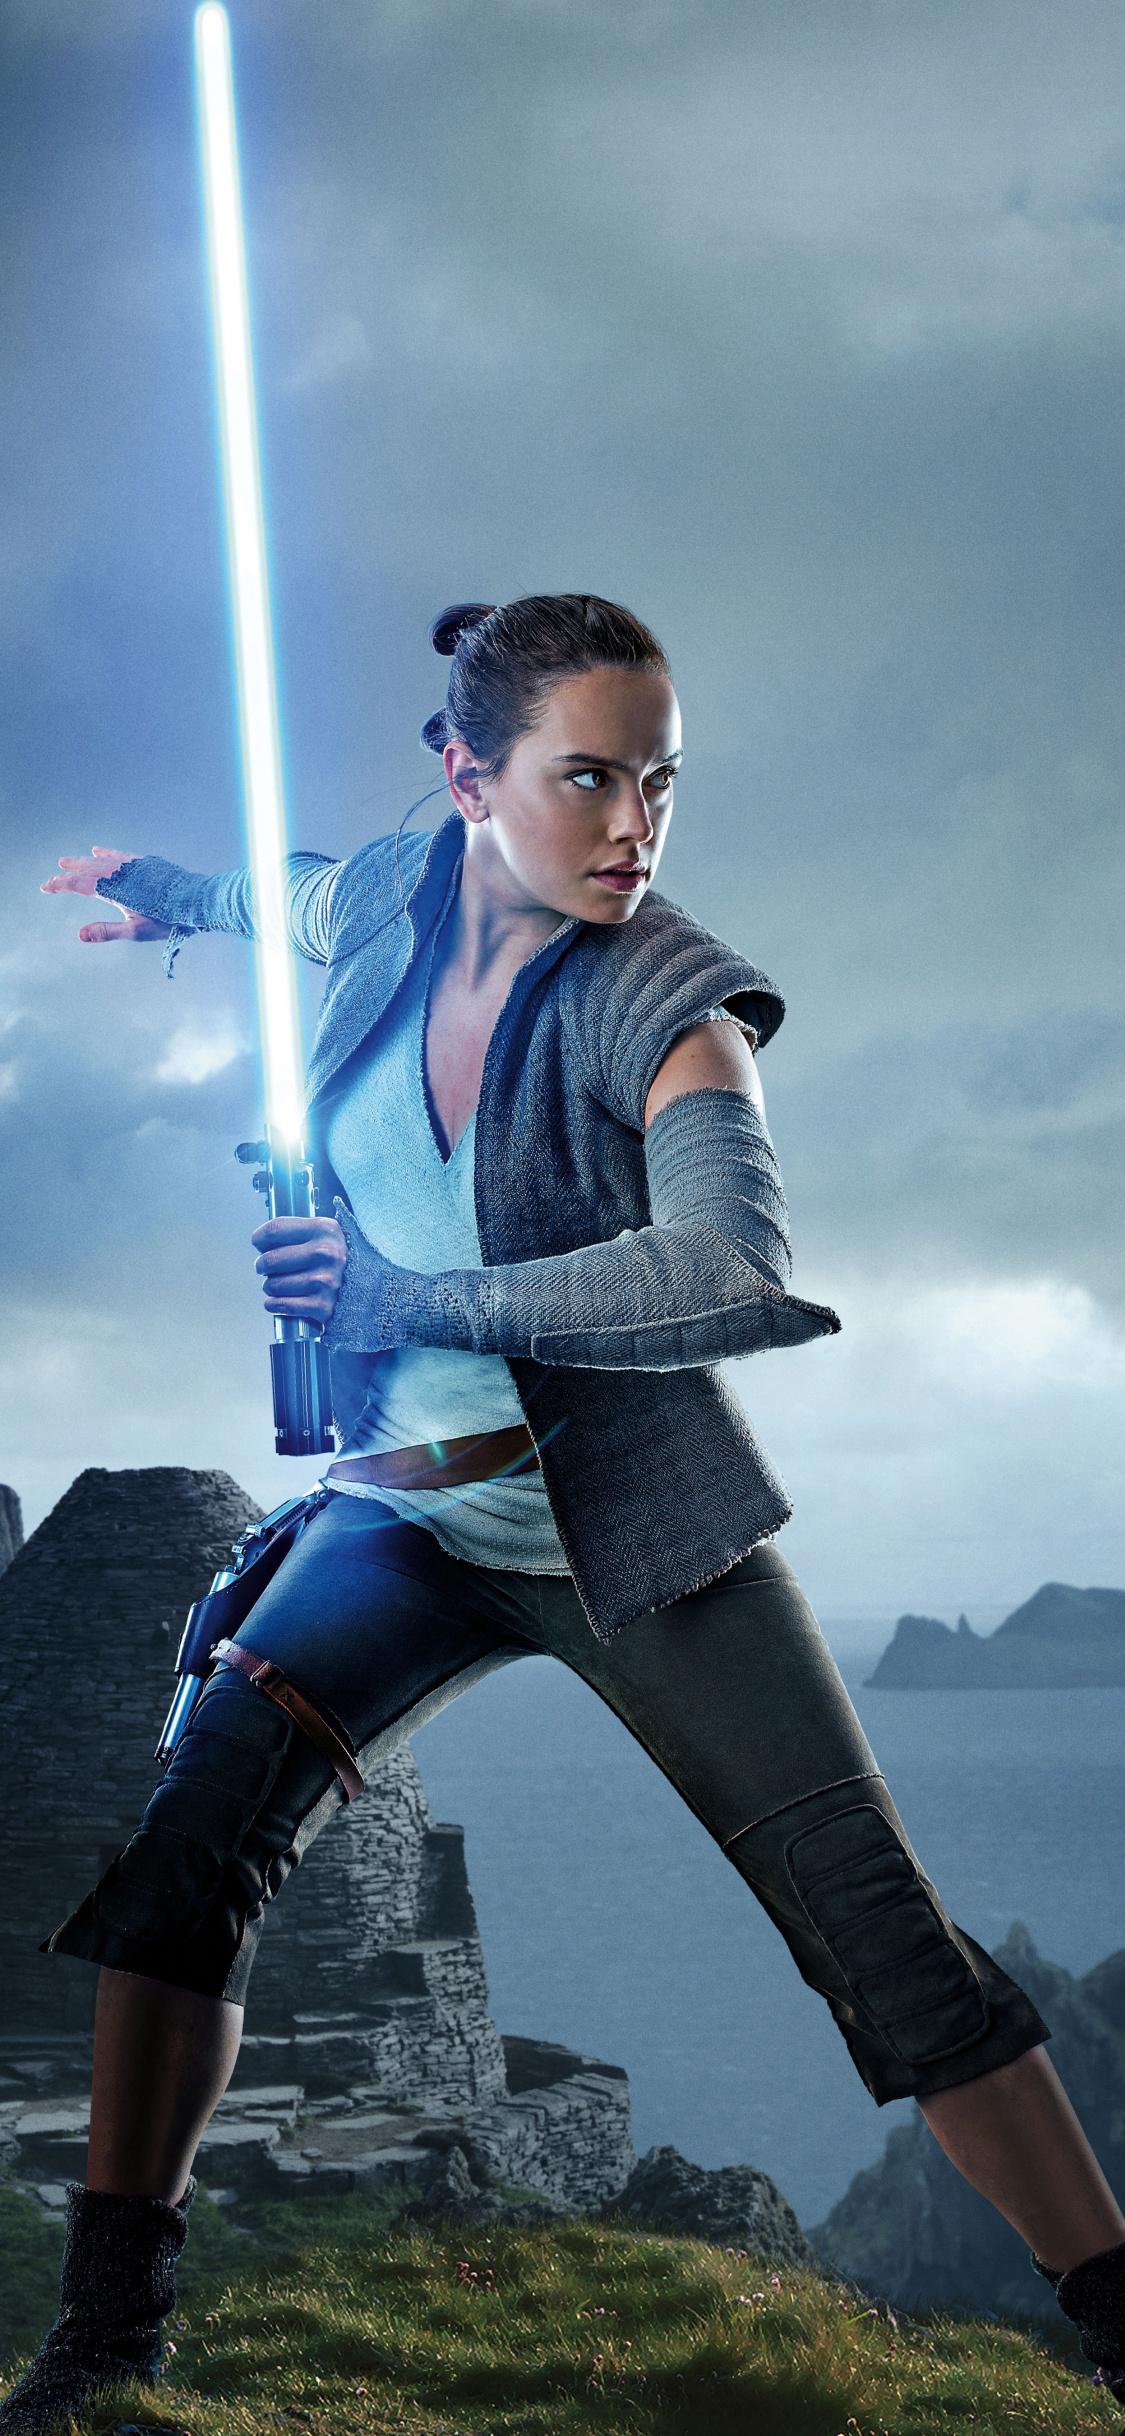 Rey Star Wars Star Wars The Rise Of Skywalker Rey 1125x2436 Wallpaper Teahub Io